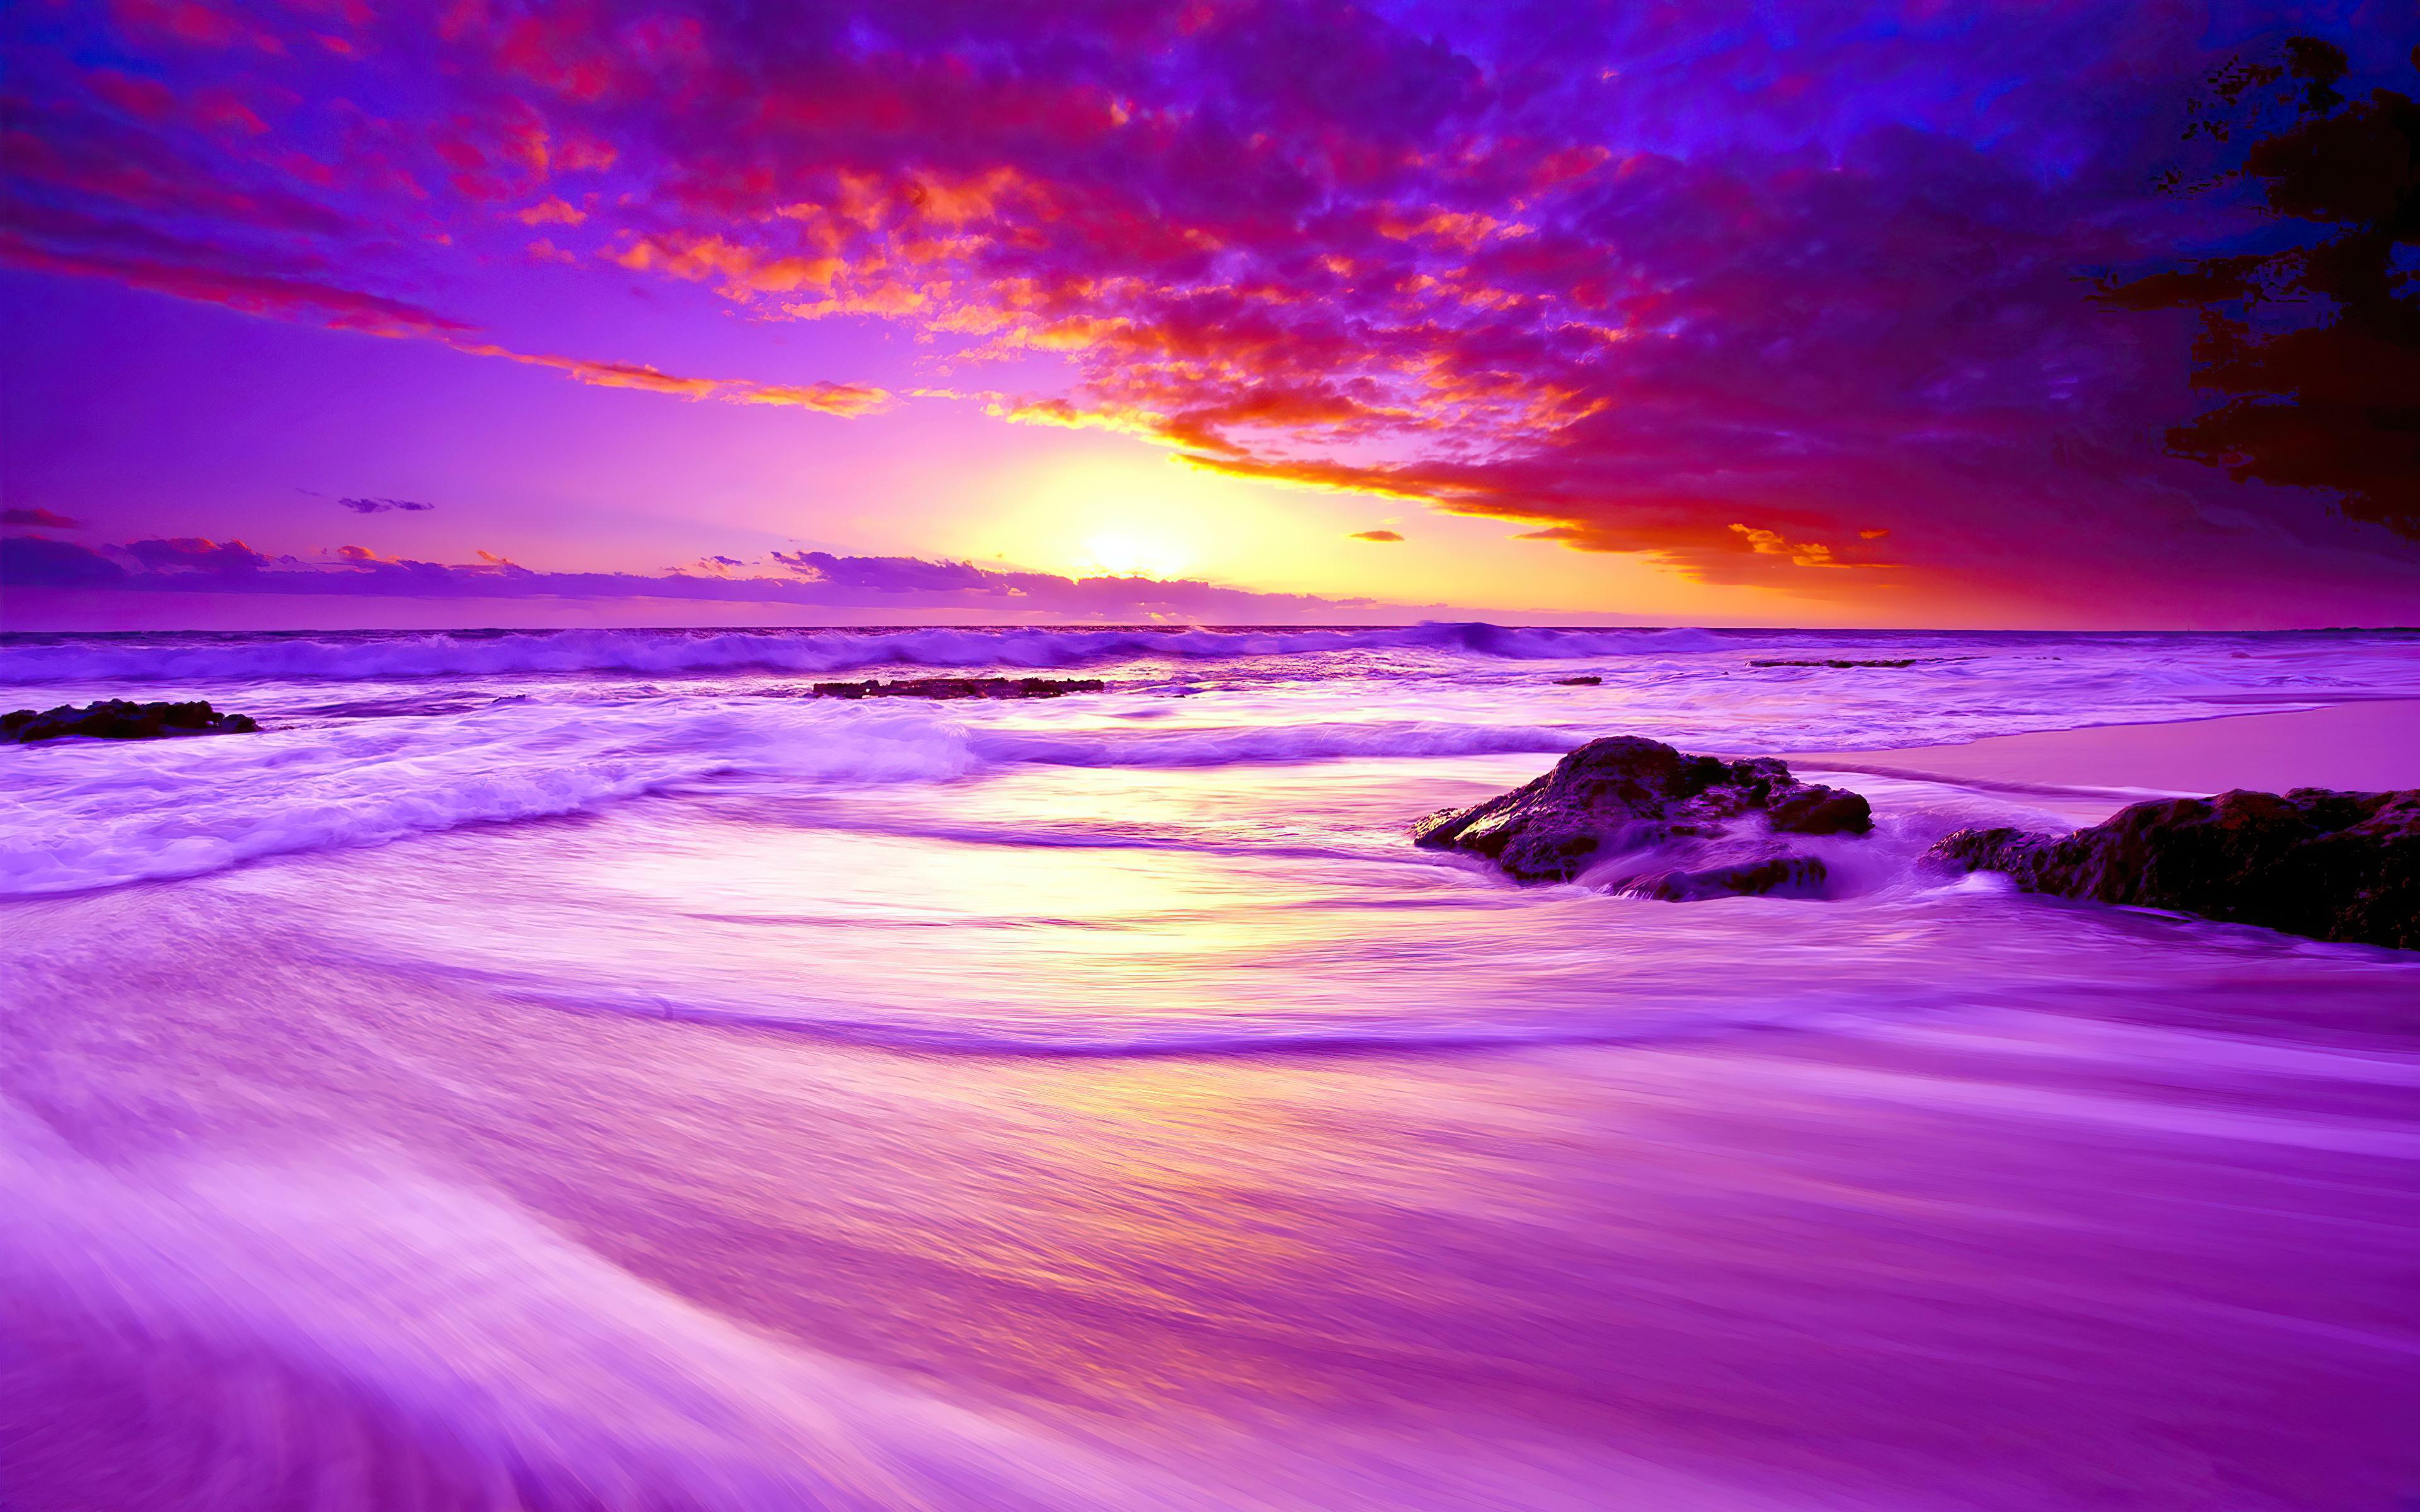 Purple Beach Sunset 4k Purple Beach Sunset 4k wallpapers